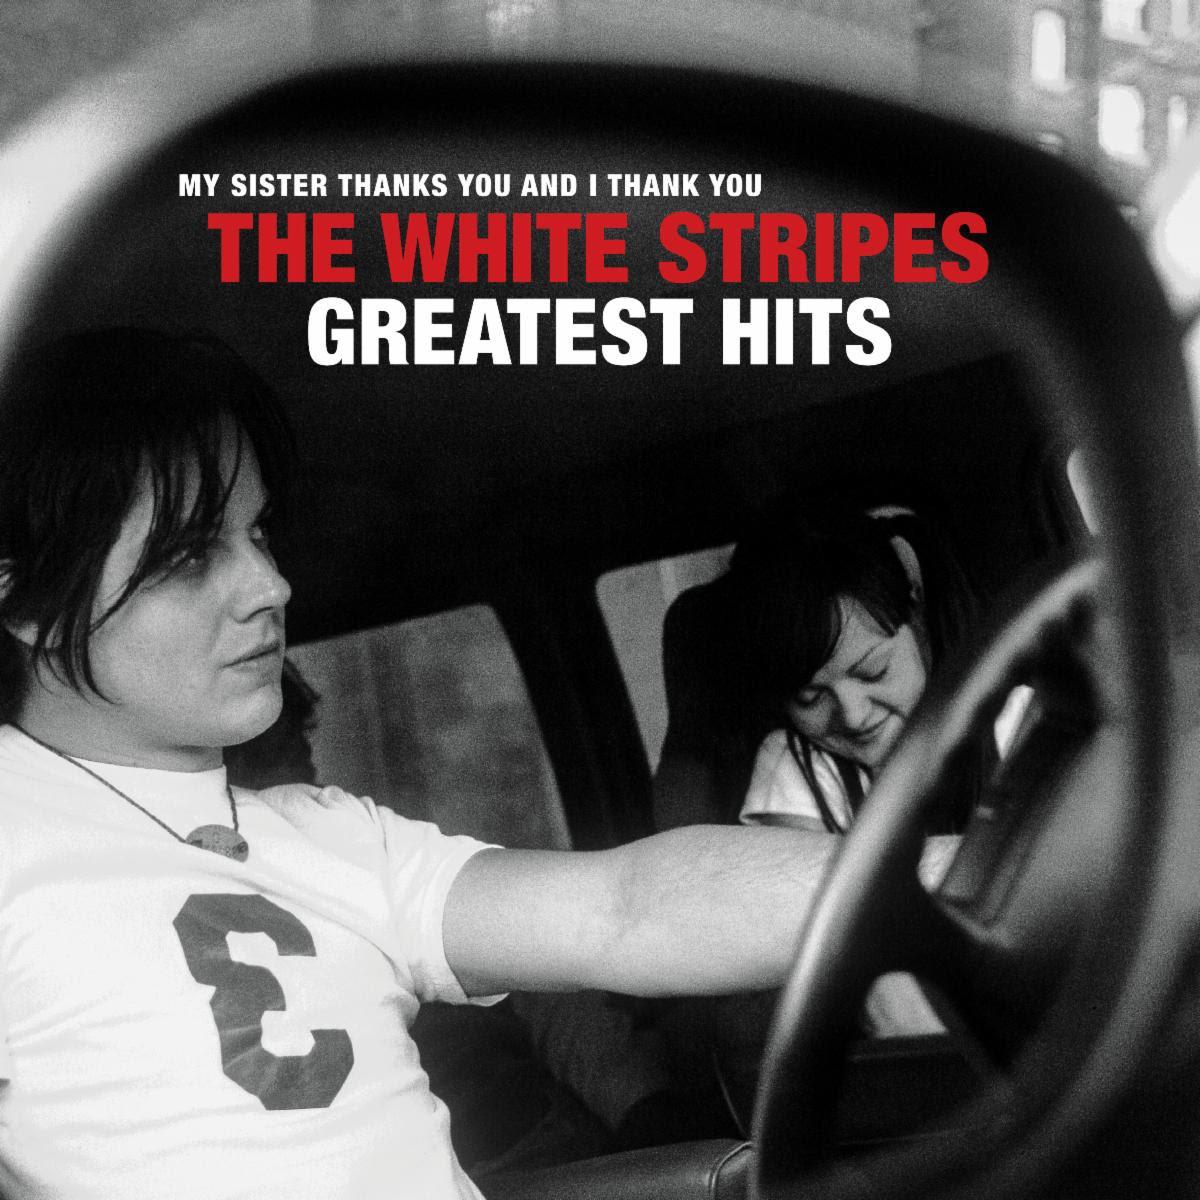 the white stripes greatest hits album cover artwork